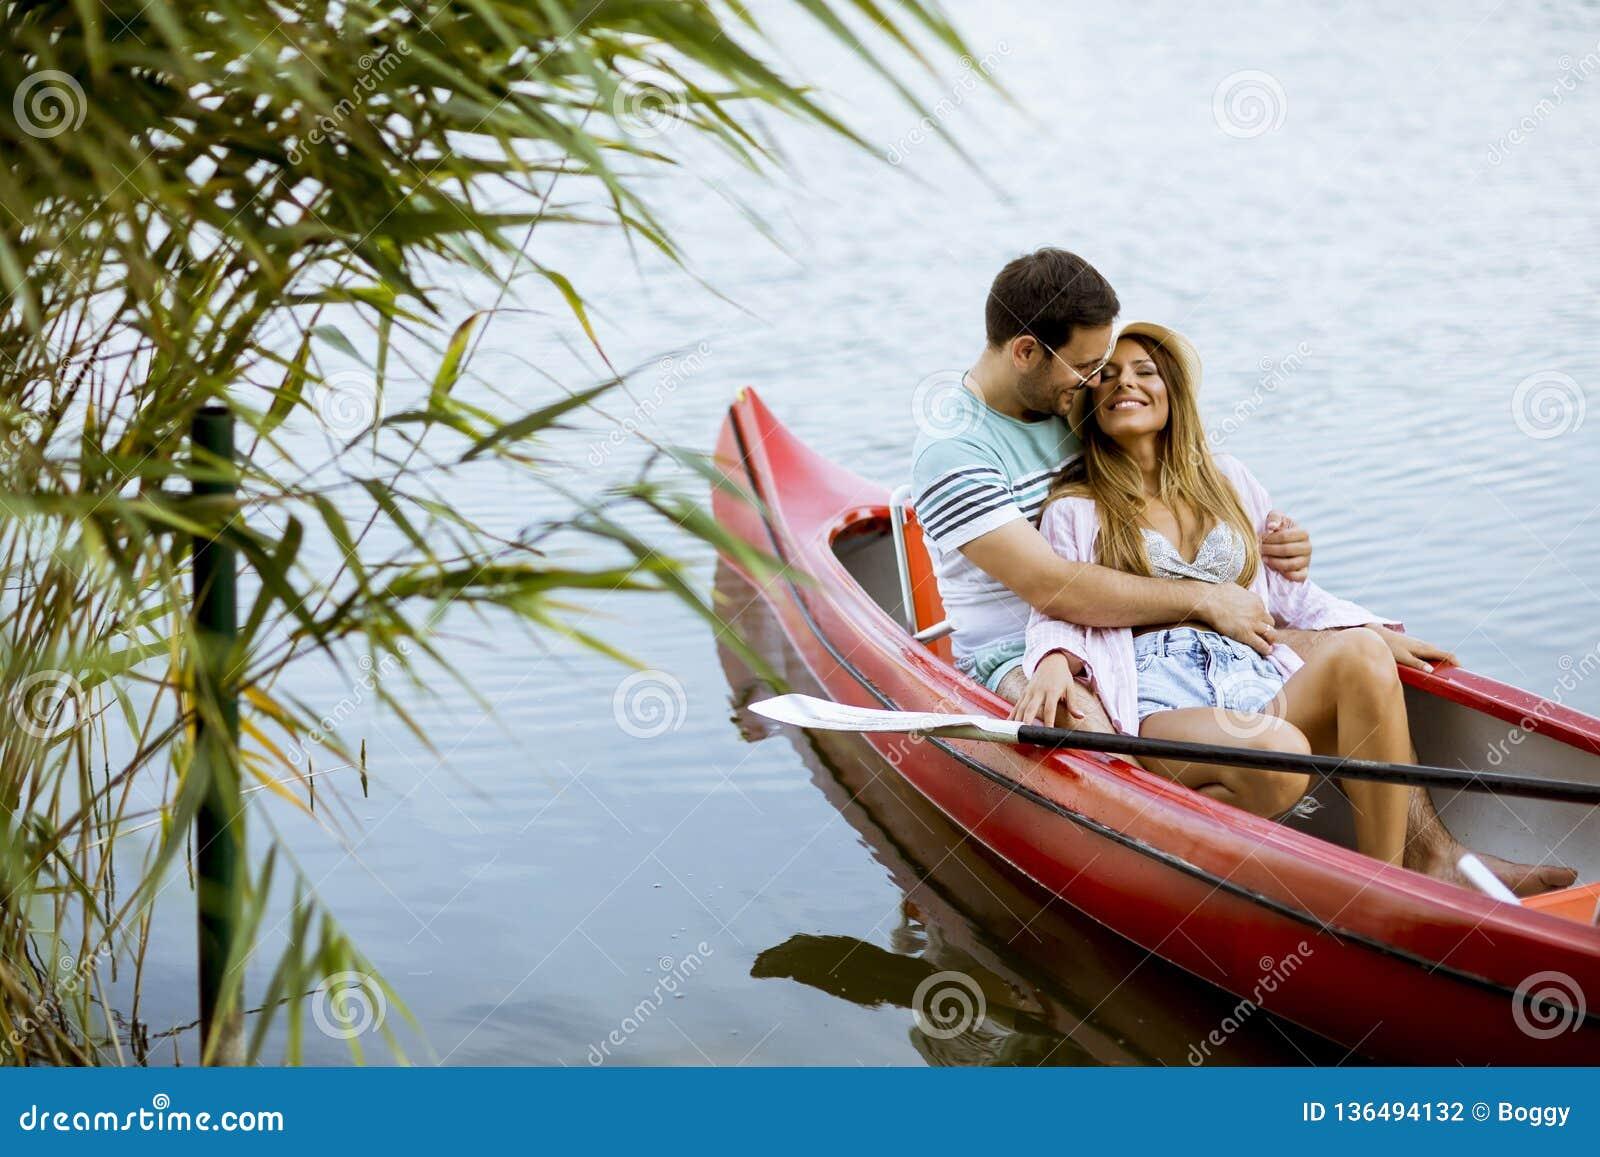 Loving Couple Rowing On The Lake Stock Photo - Image of ...